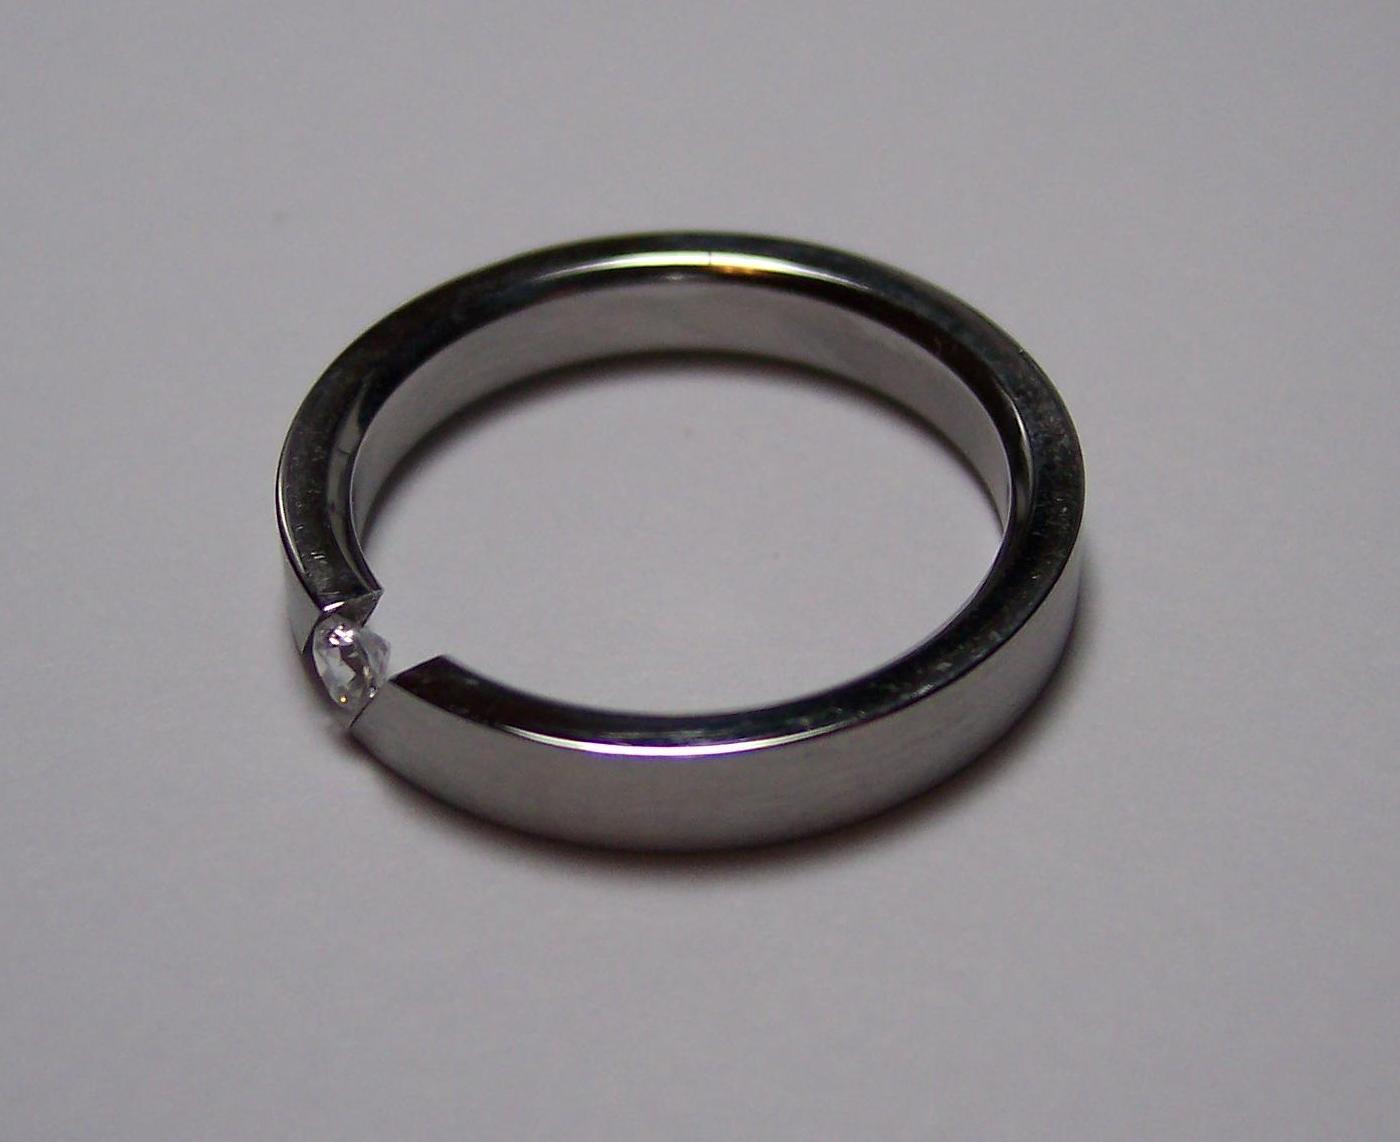 tension-set diamond ring - protective gem settings